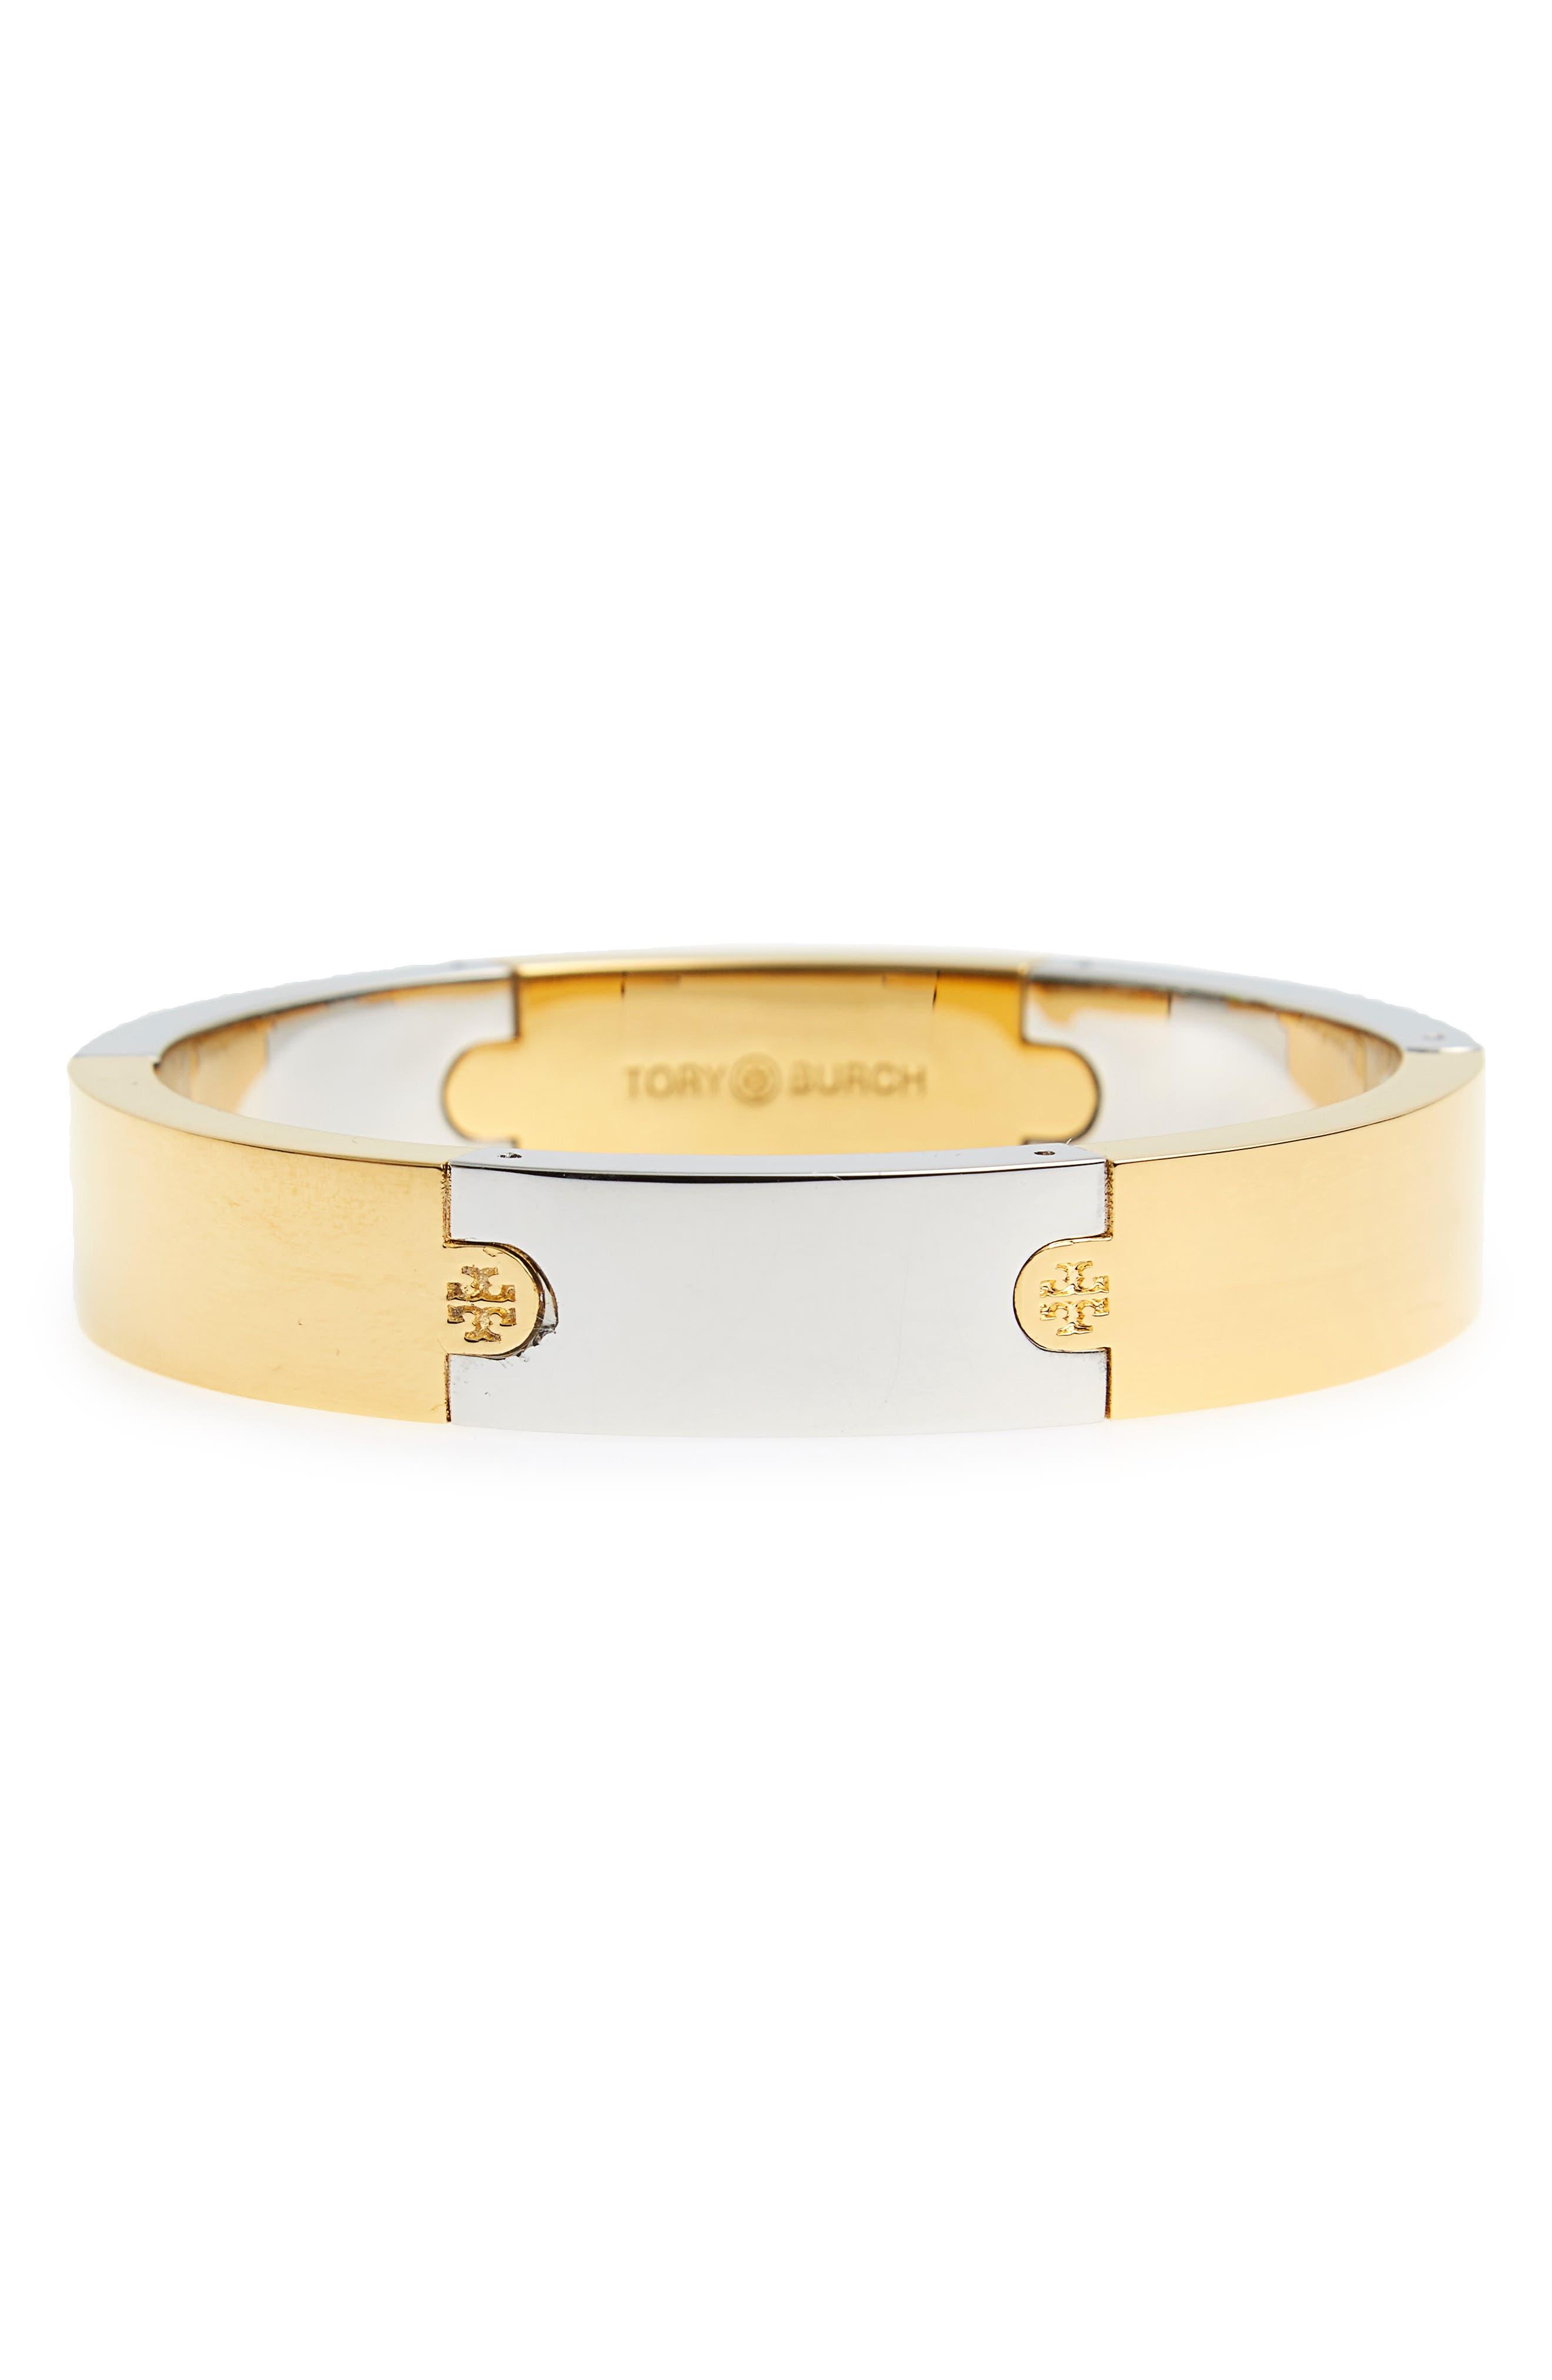 Puzzle Bracelet,                         Main,                         color, Tory Gold / Tory Silver